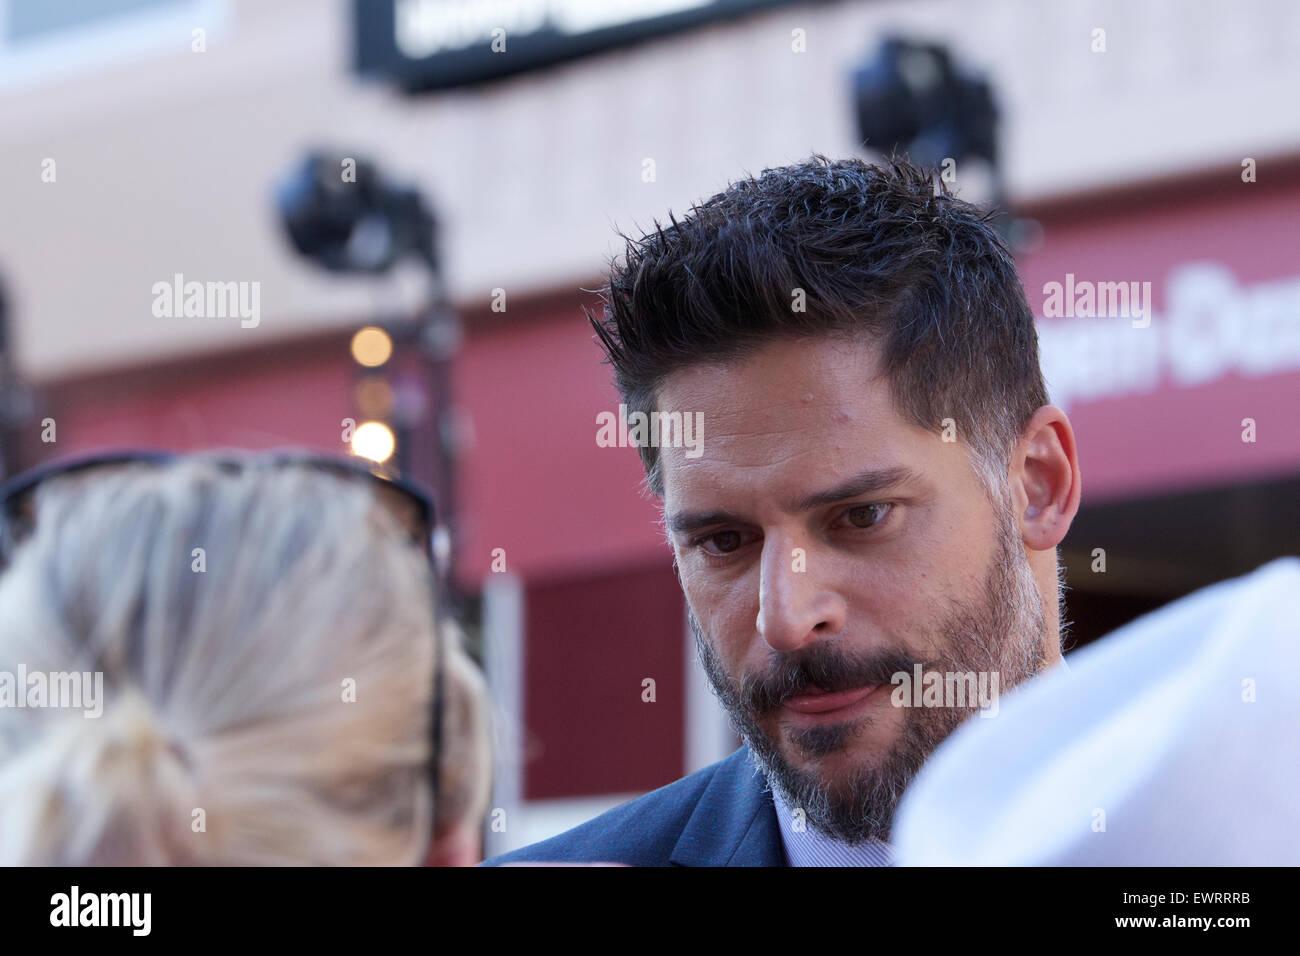 "London, UK. 30. Juni 2015. Der Film-Premiere von ""Magic Mike XXL'at Vue Kino in Leicester Square,London.The Film Stockfoto"